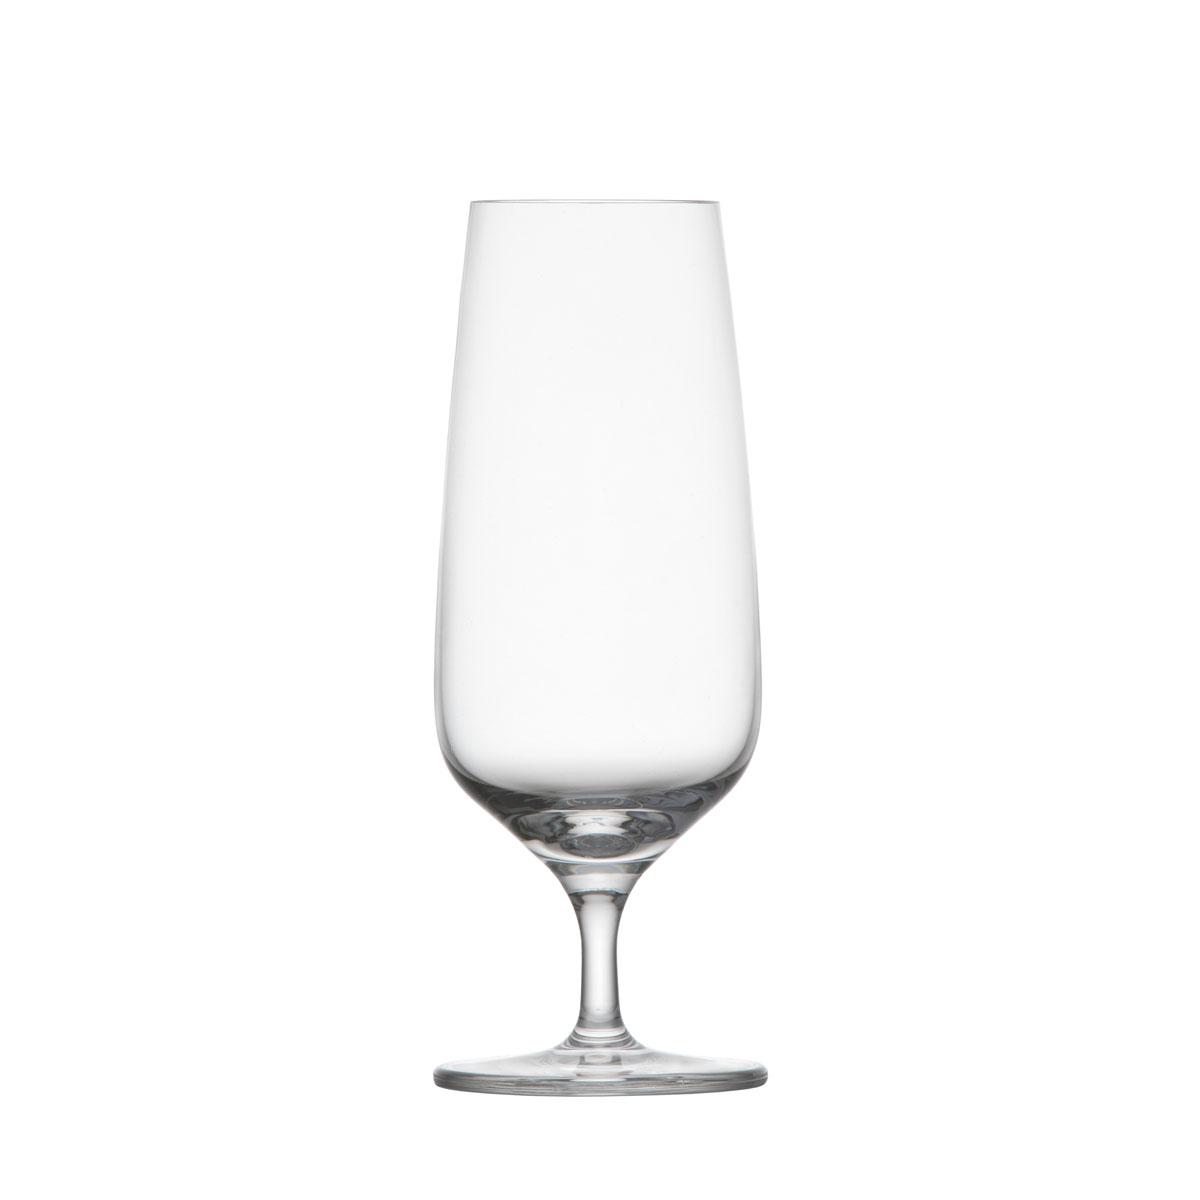 Schott Zwiesel Tritan Bistro Champagne Flute, Single